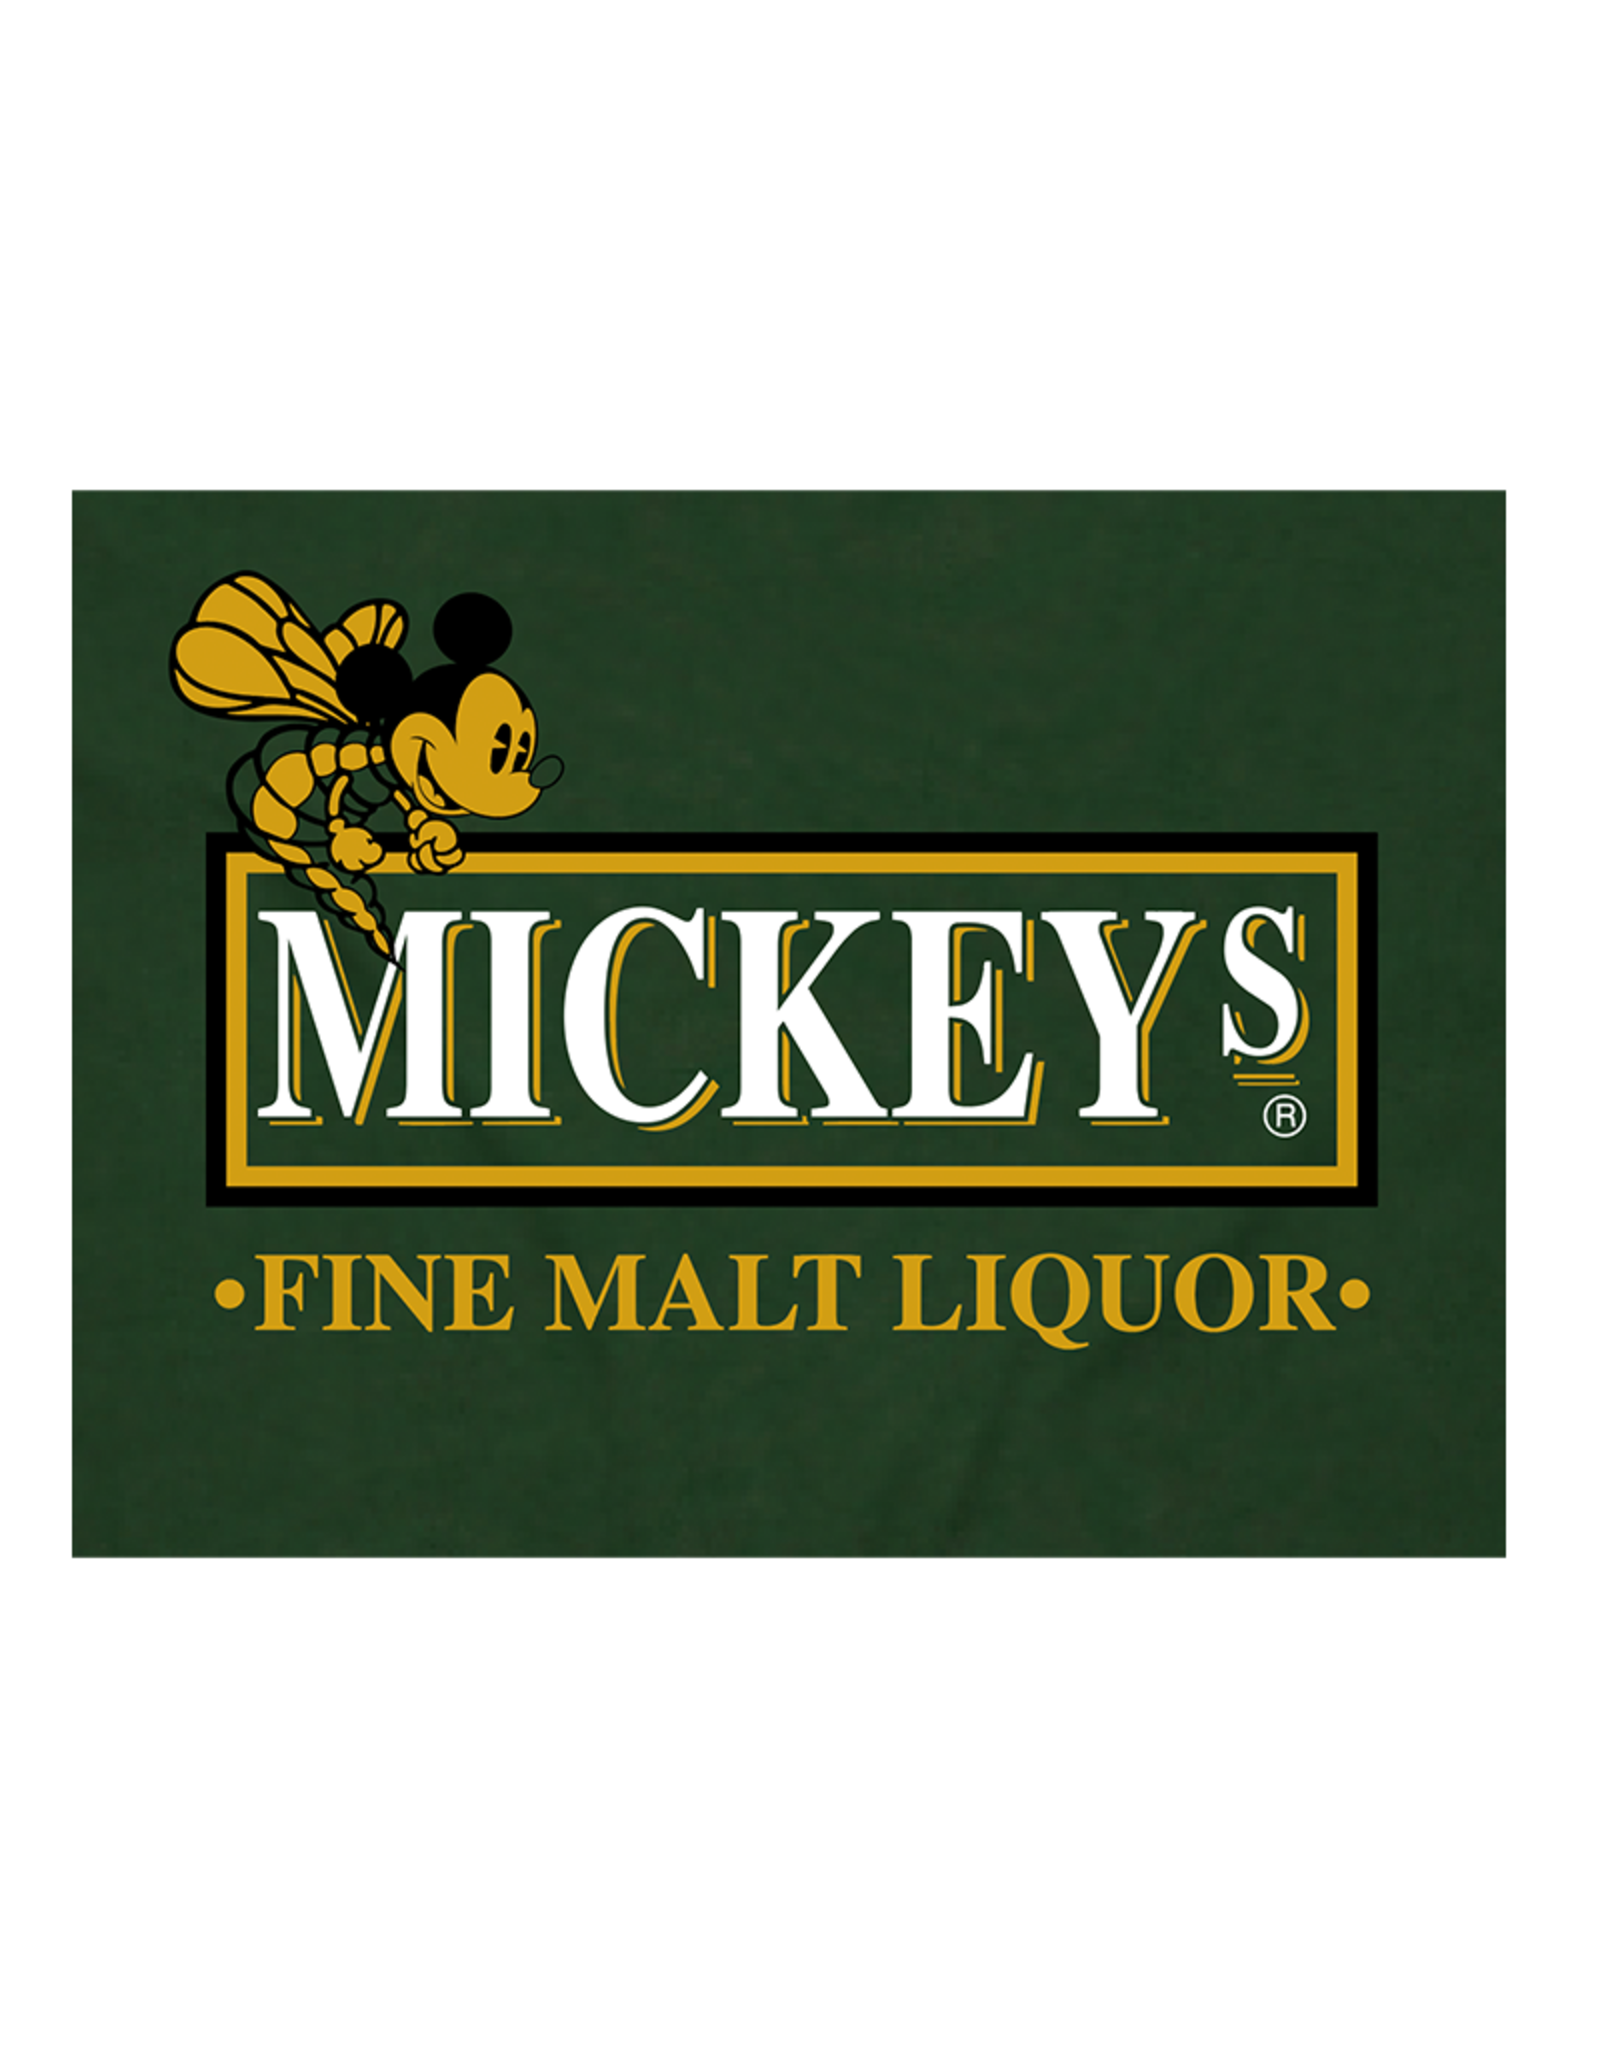 Mickey's Malt Liquor